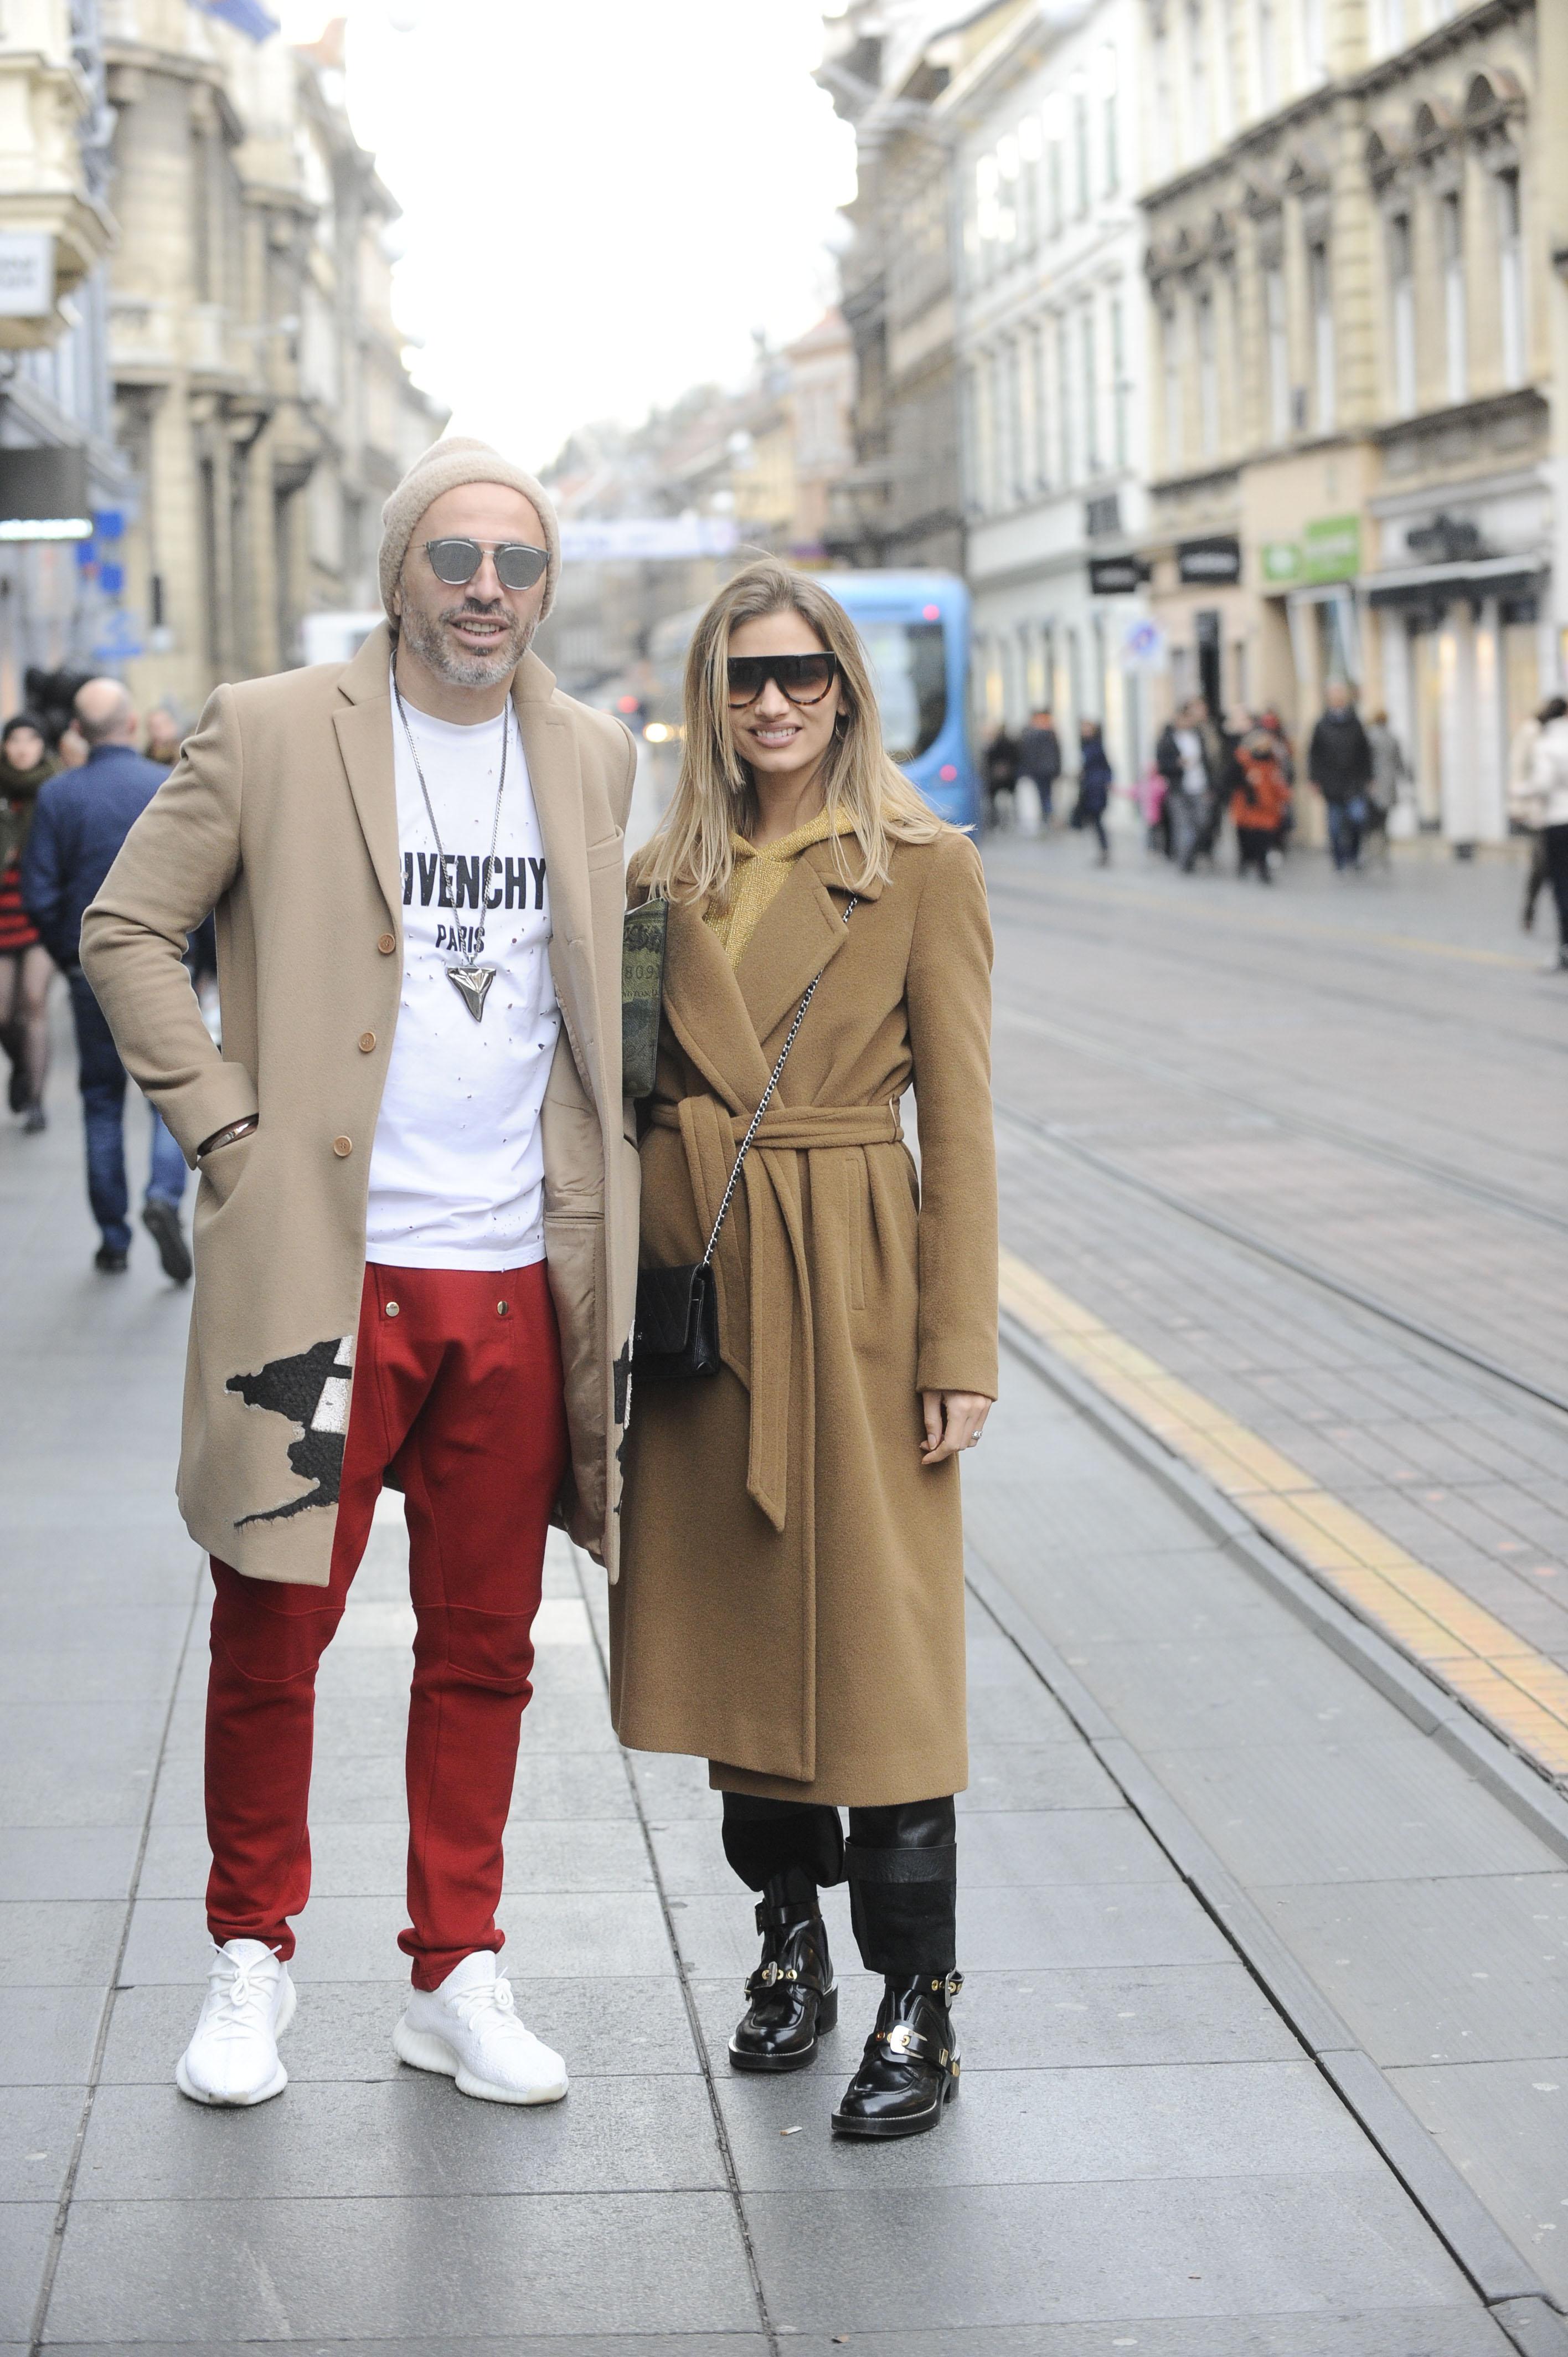 Spica / Zagreb 25.11.2017. / foto: Davor Matota / Marina Lackovic Matic i suprug Kreso Matic